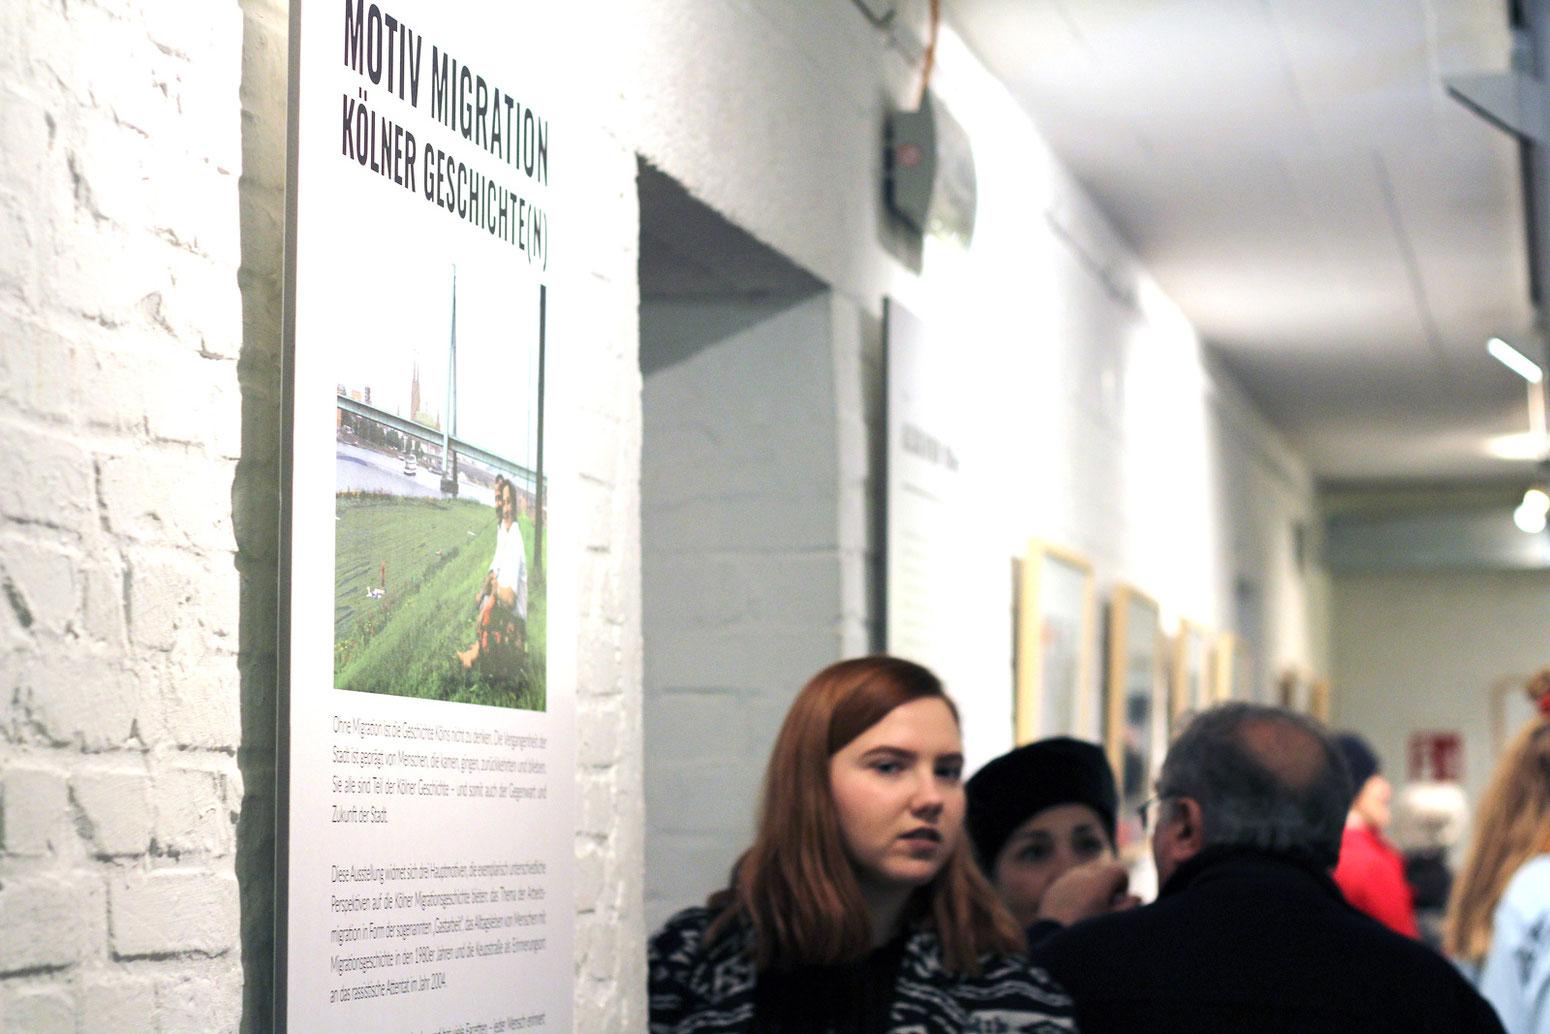 Eröffnung des Mülheimer Heimatministeriums im Kulturbunker Mülheim mit der Ausstellung »Motiv Migration« des DOMiD e. V. am 16. März 2019. Fotos: Eva Rusch